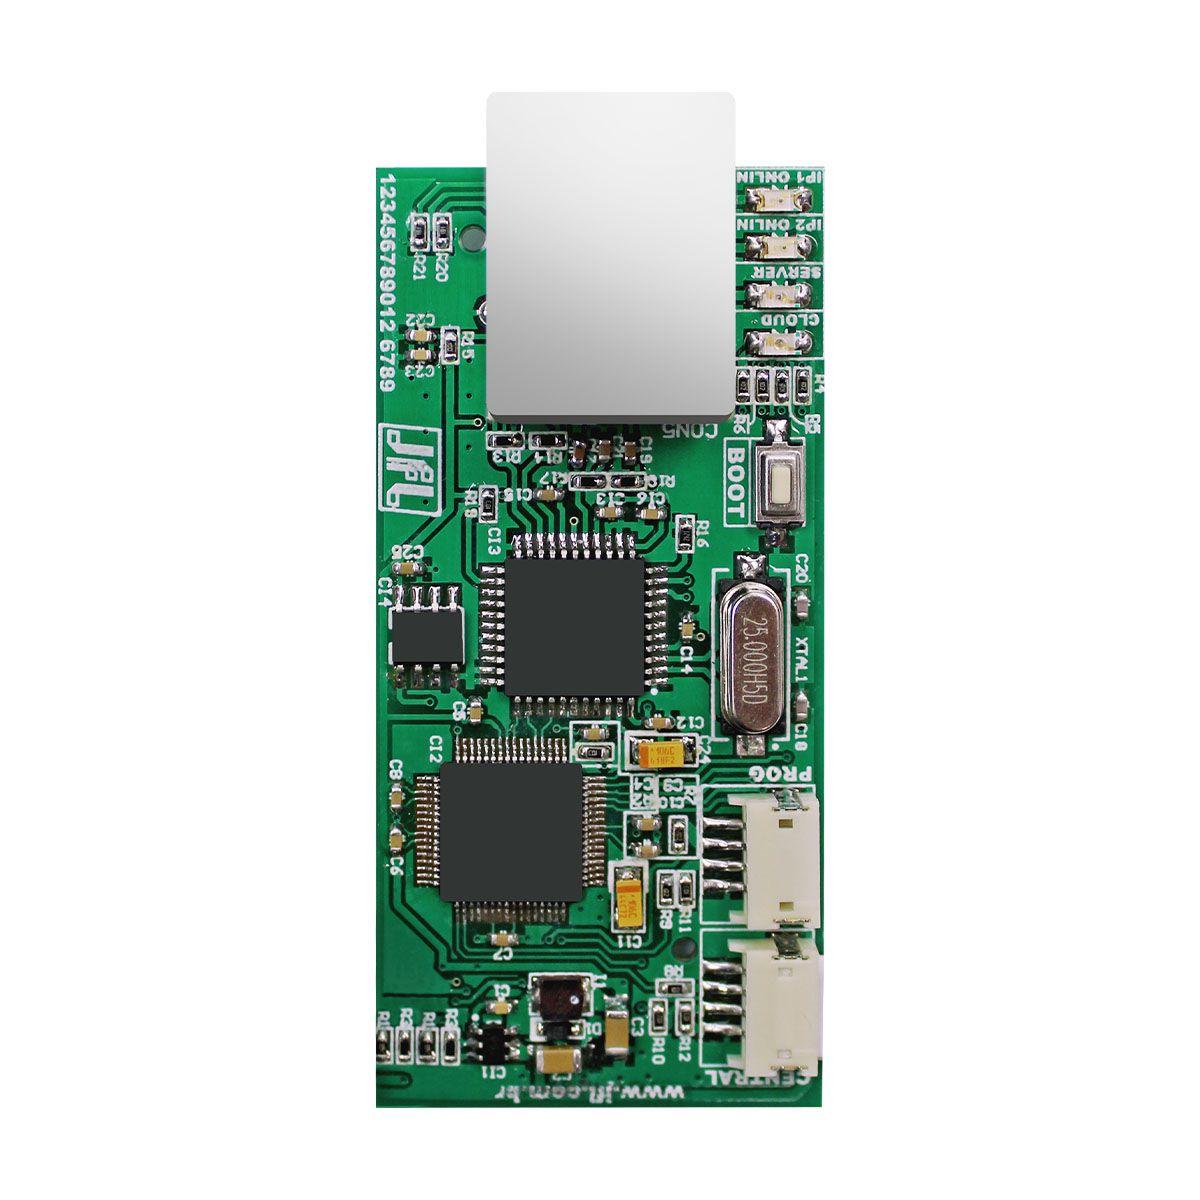 Kit Alarme Jfl SmartCloud 18 Com Modulo Ethernet E Sensores Jfl